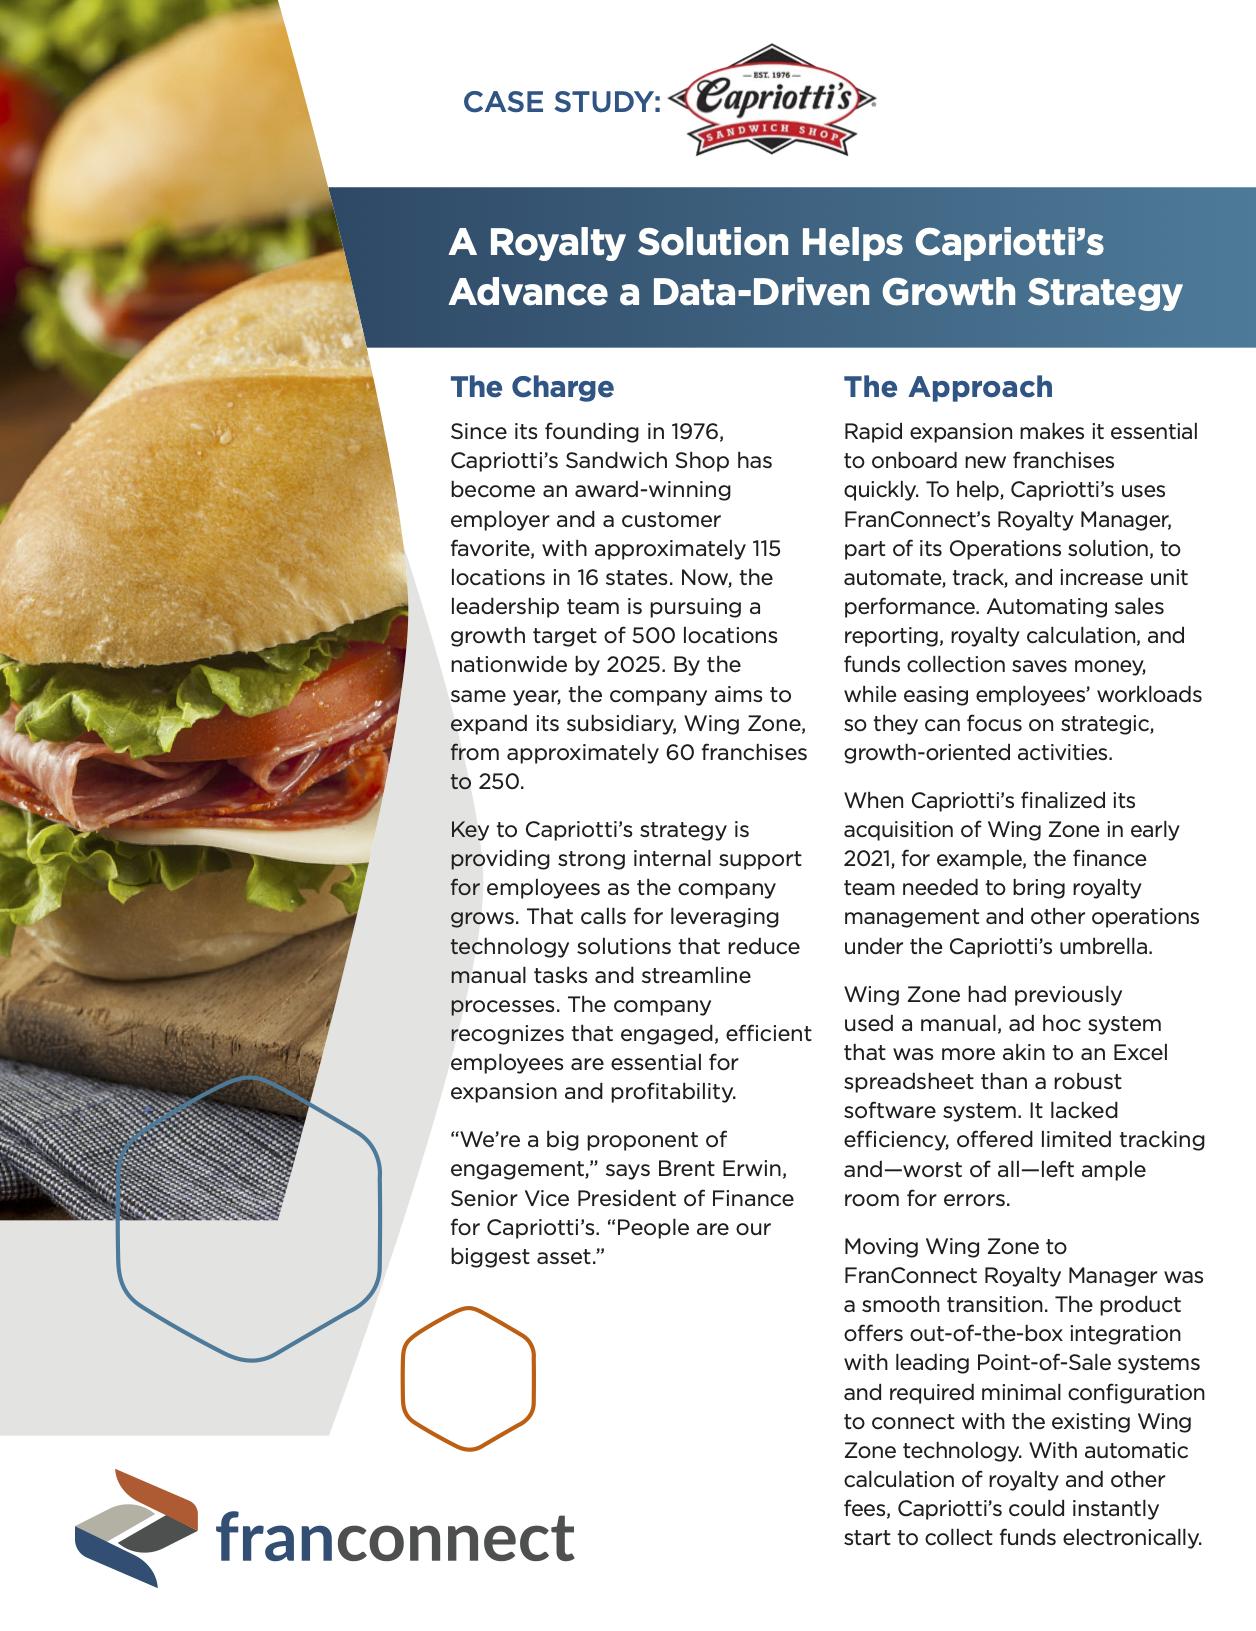 Capriottis case study featured image